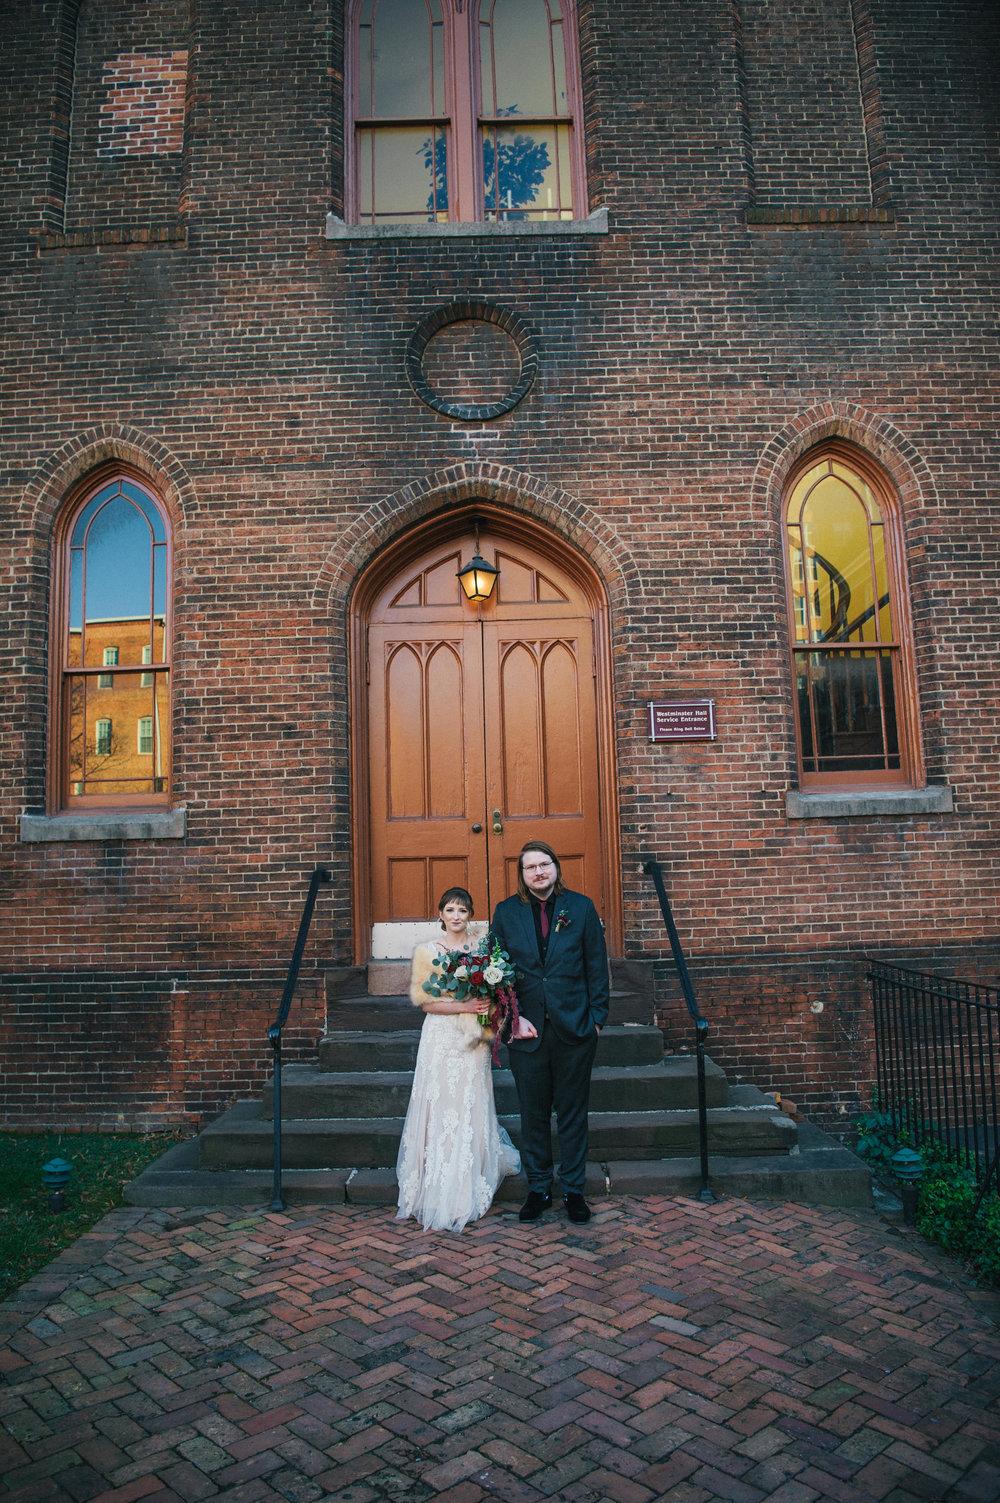 Amber and Kyles Wedding 35.jpg